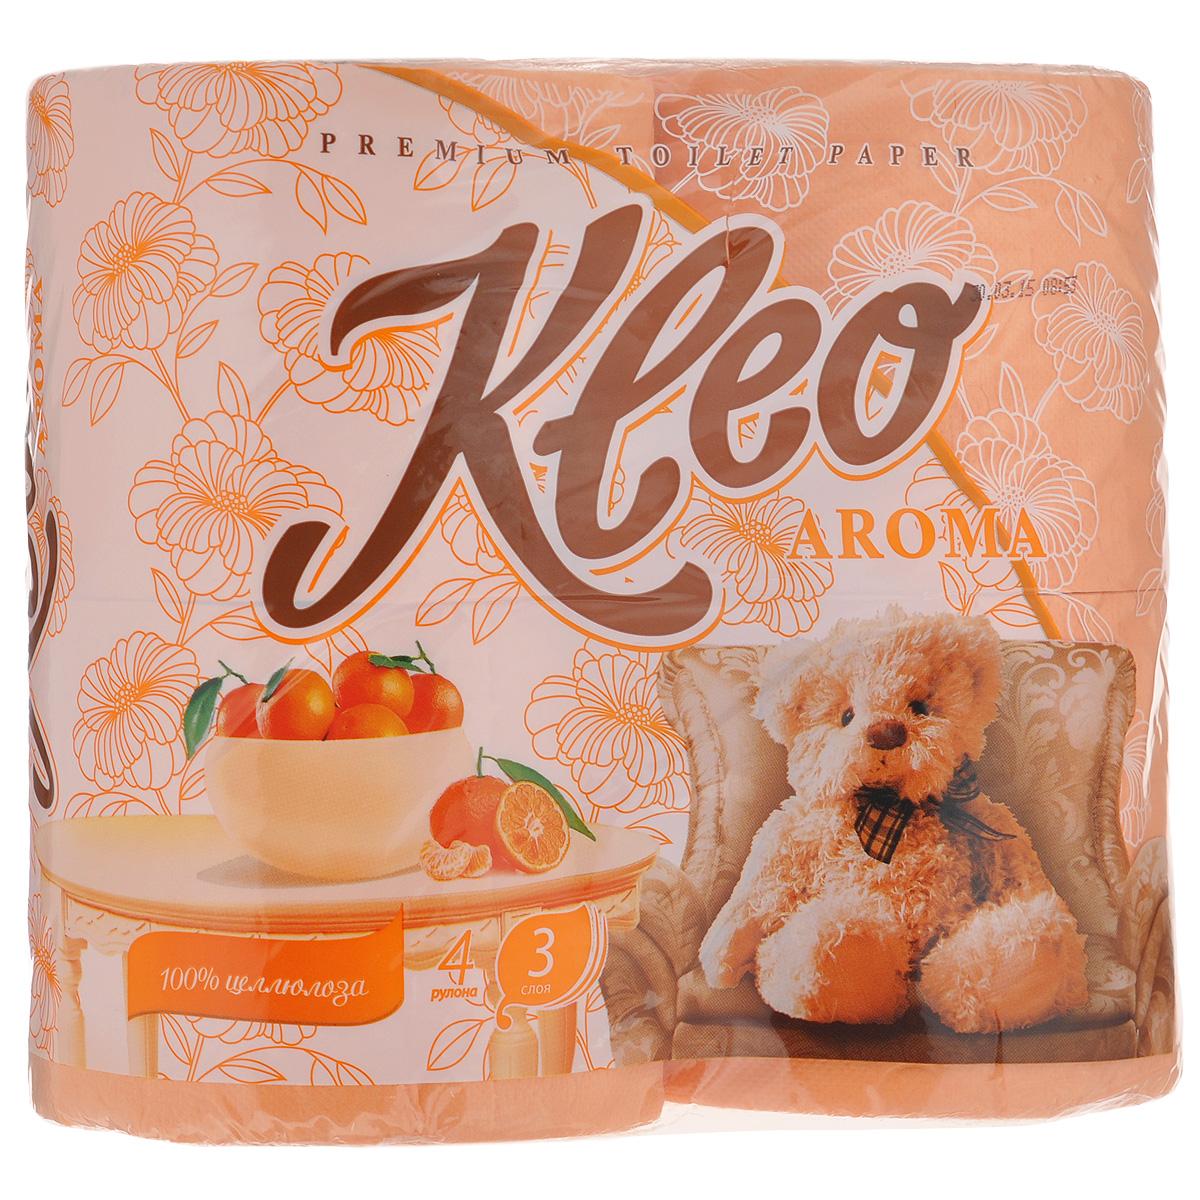 Туалетная бумага Kleo Aroma. Mandarin, трехслойная, цвет: персиковый, 4 рулона ароматизатор aroma wind 002 a